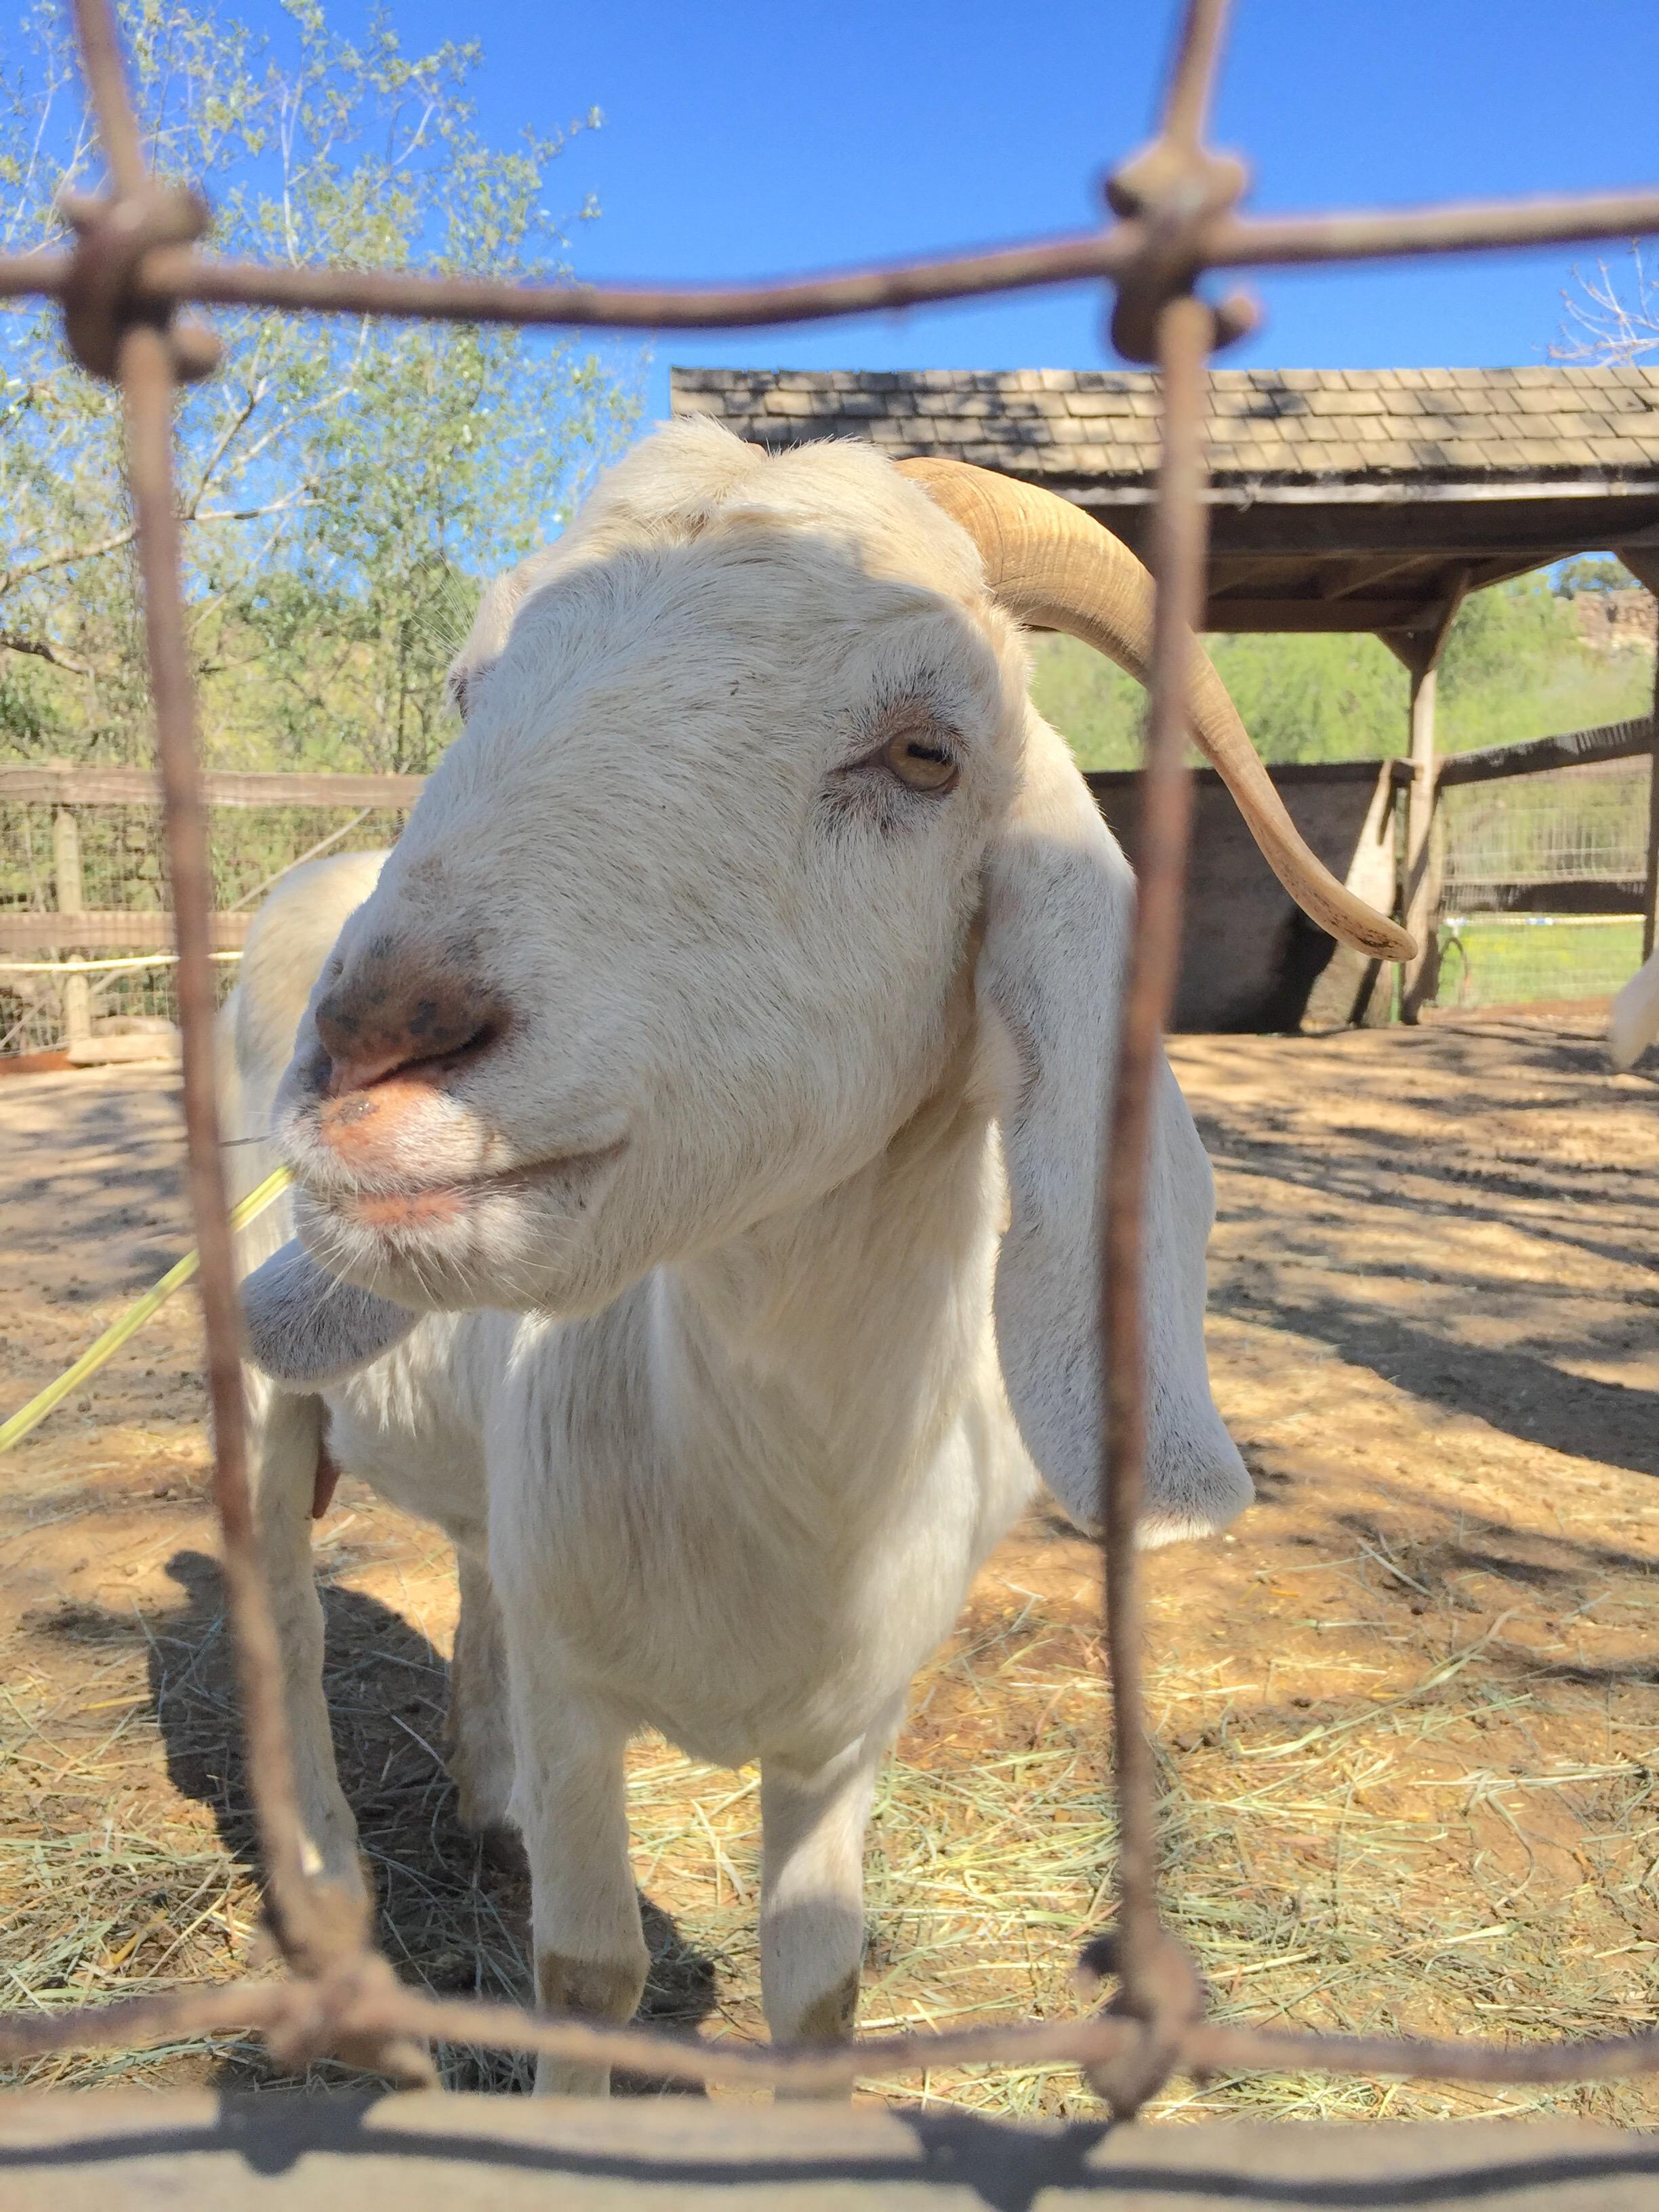 Closeup shot of a white mama goat at Avila Valley Barn in San Luis Obispo.